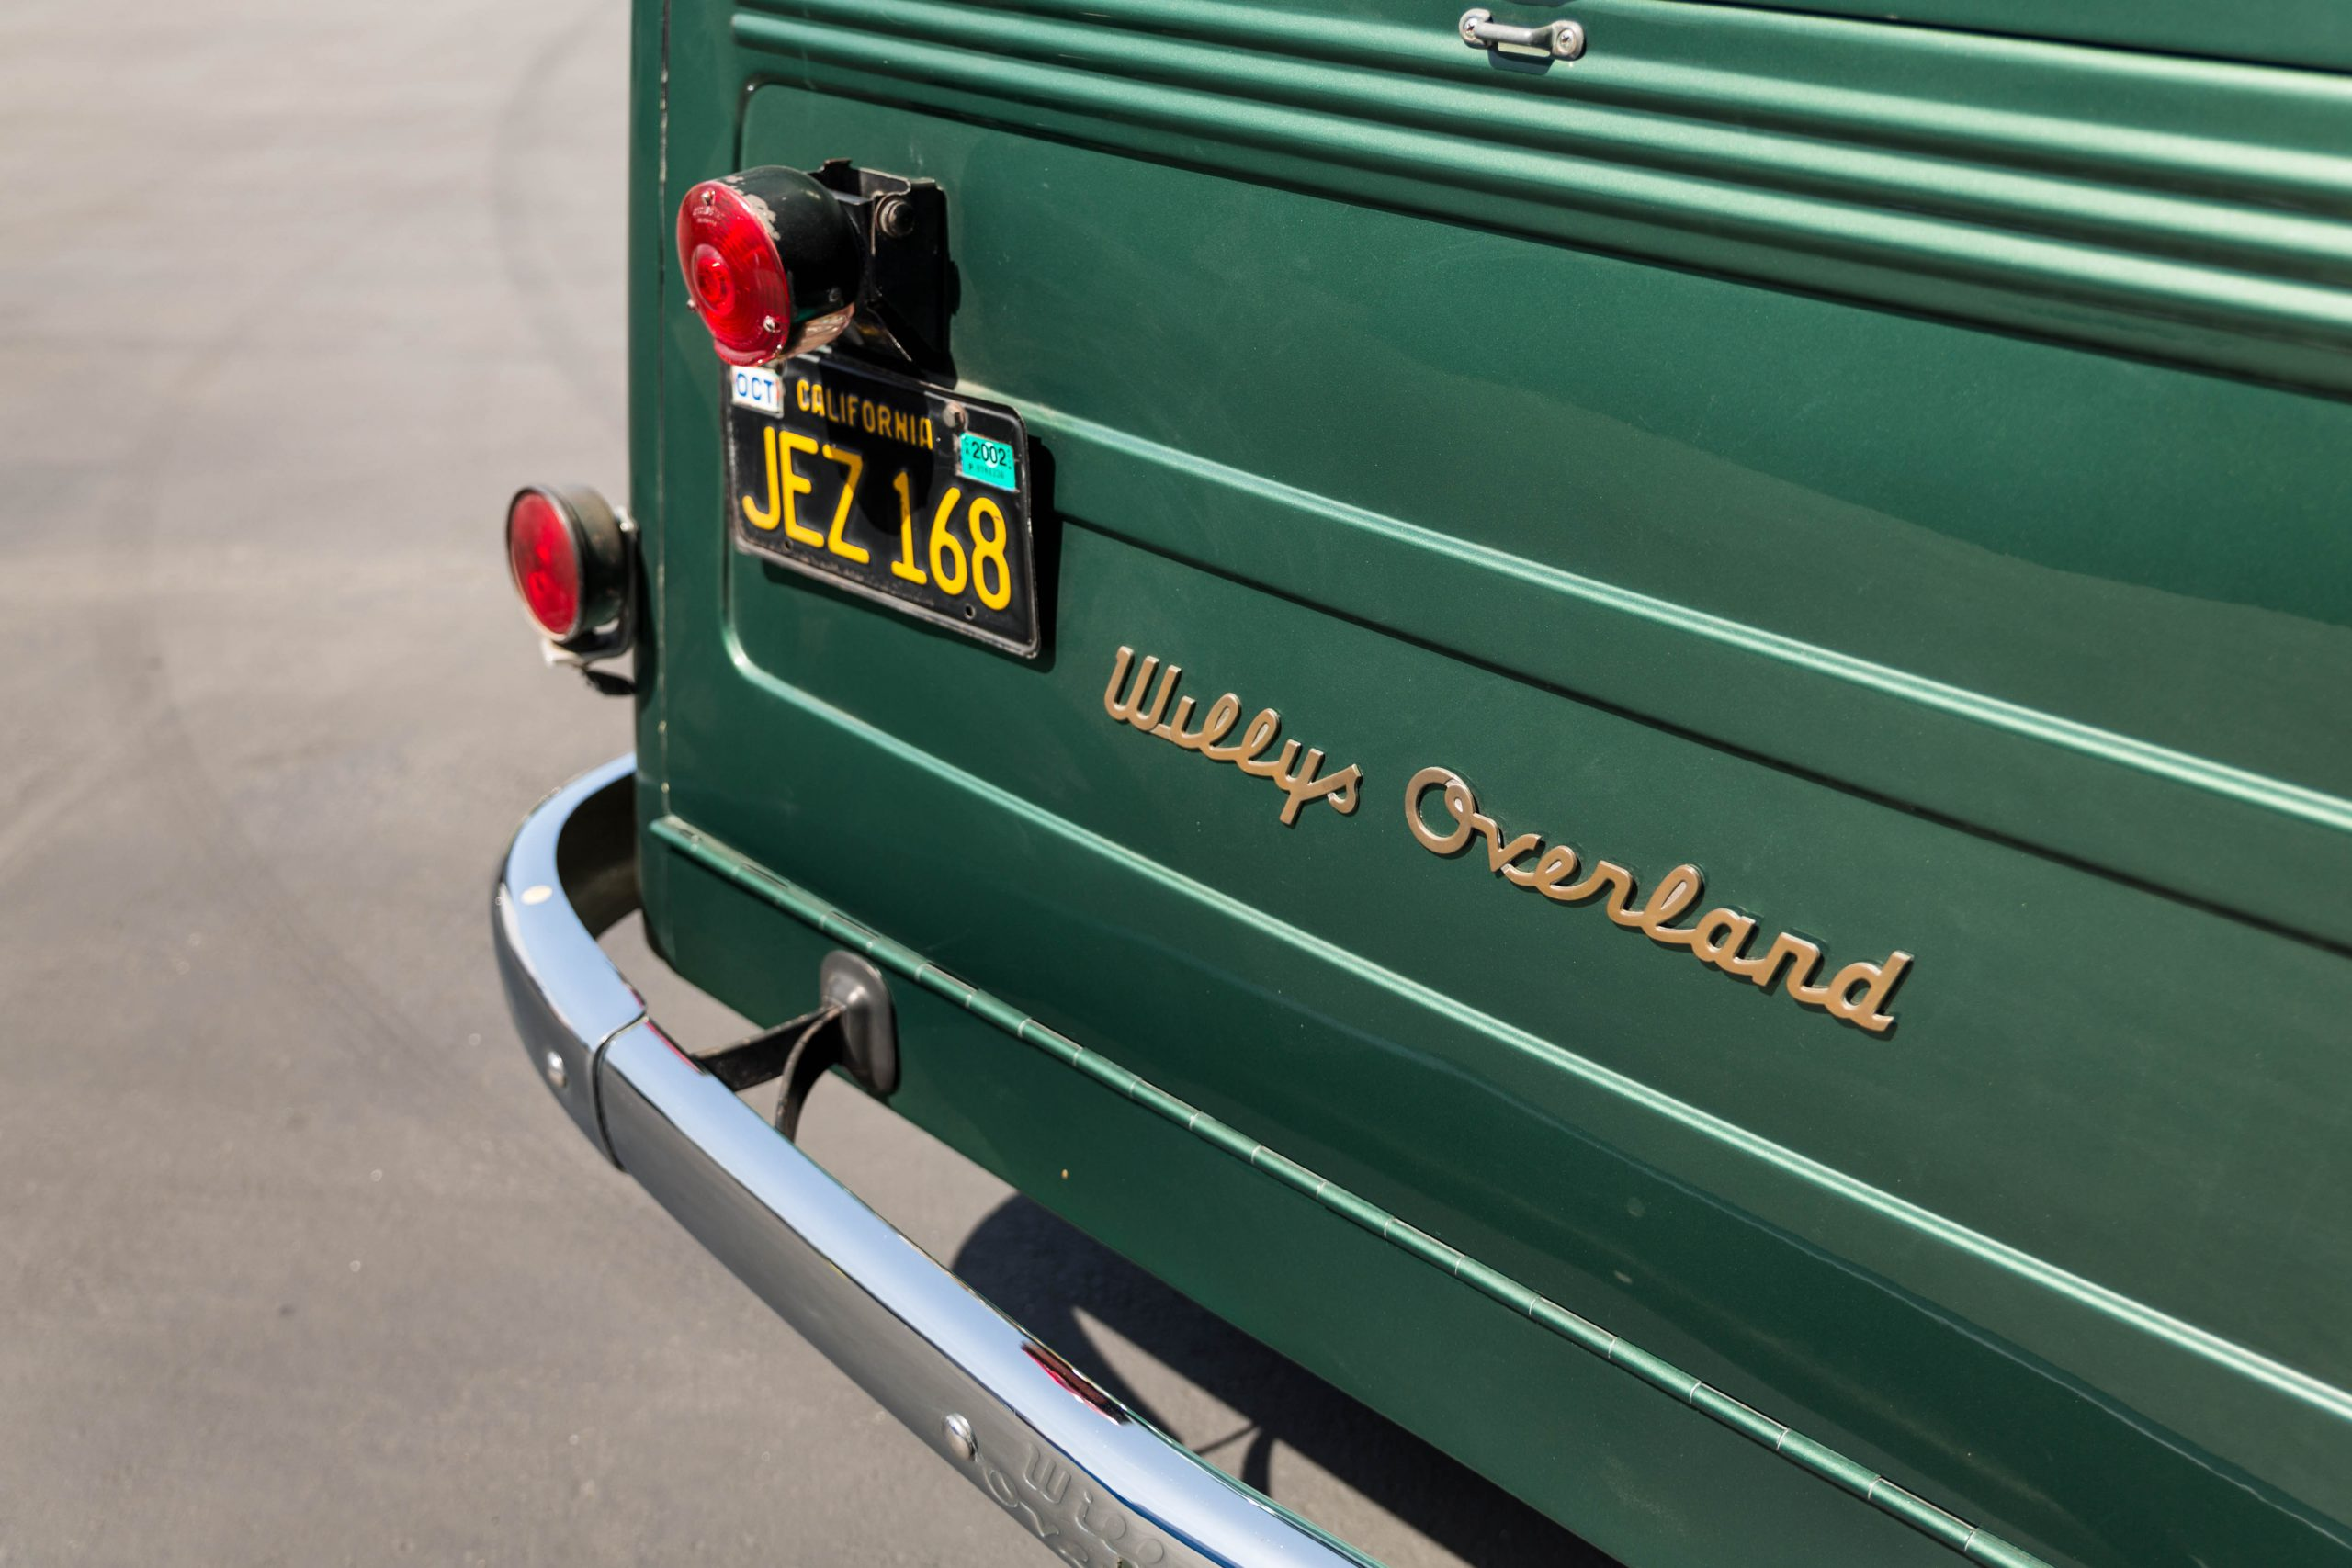 1949-Willys-Jeep-Station-Wagon-Camper rear emblem